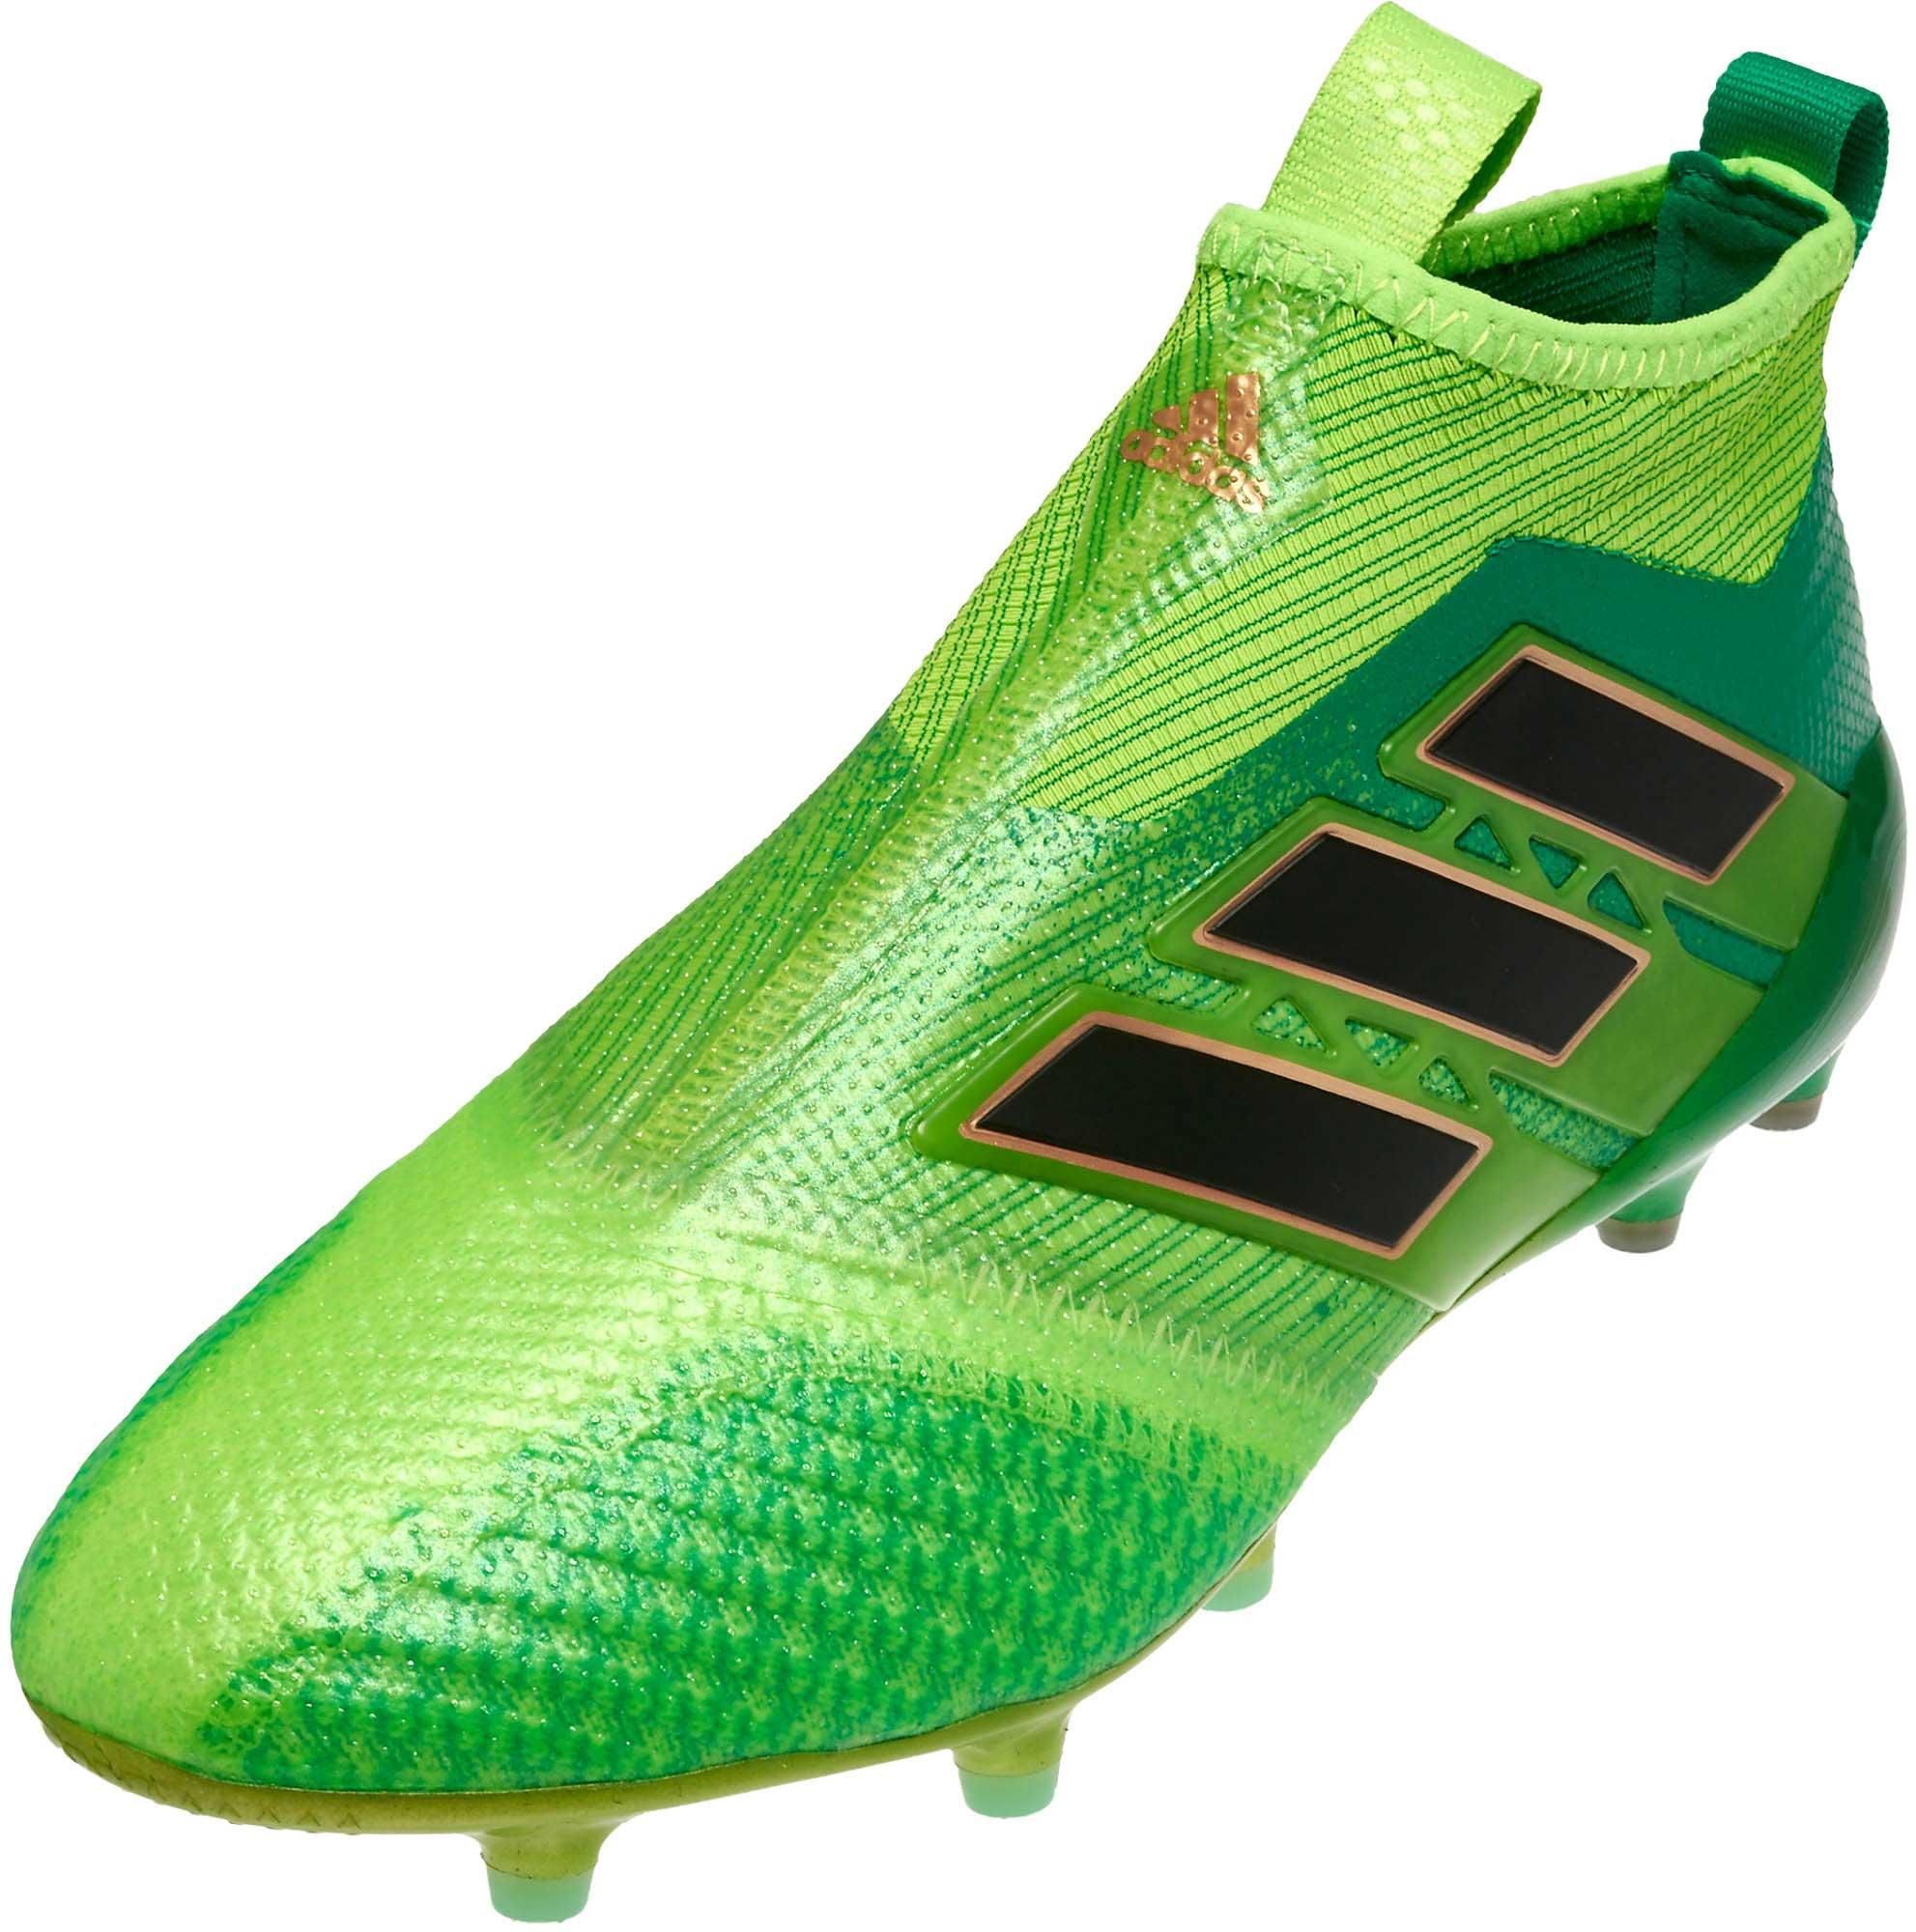 36db7ab053d adidas ACE 17+ Purecontrol FG Soccer Cleats - Solar Green   Black ...